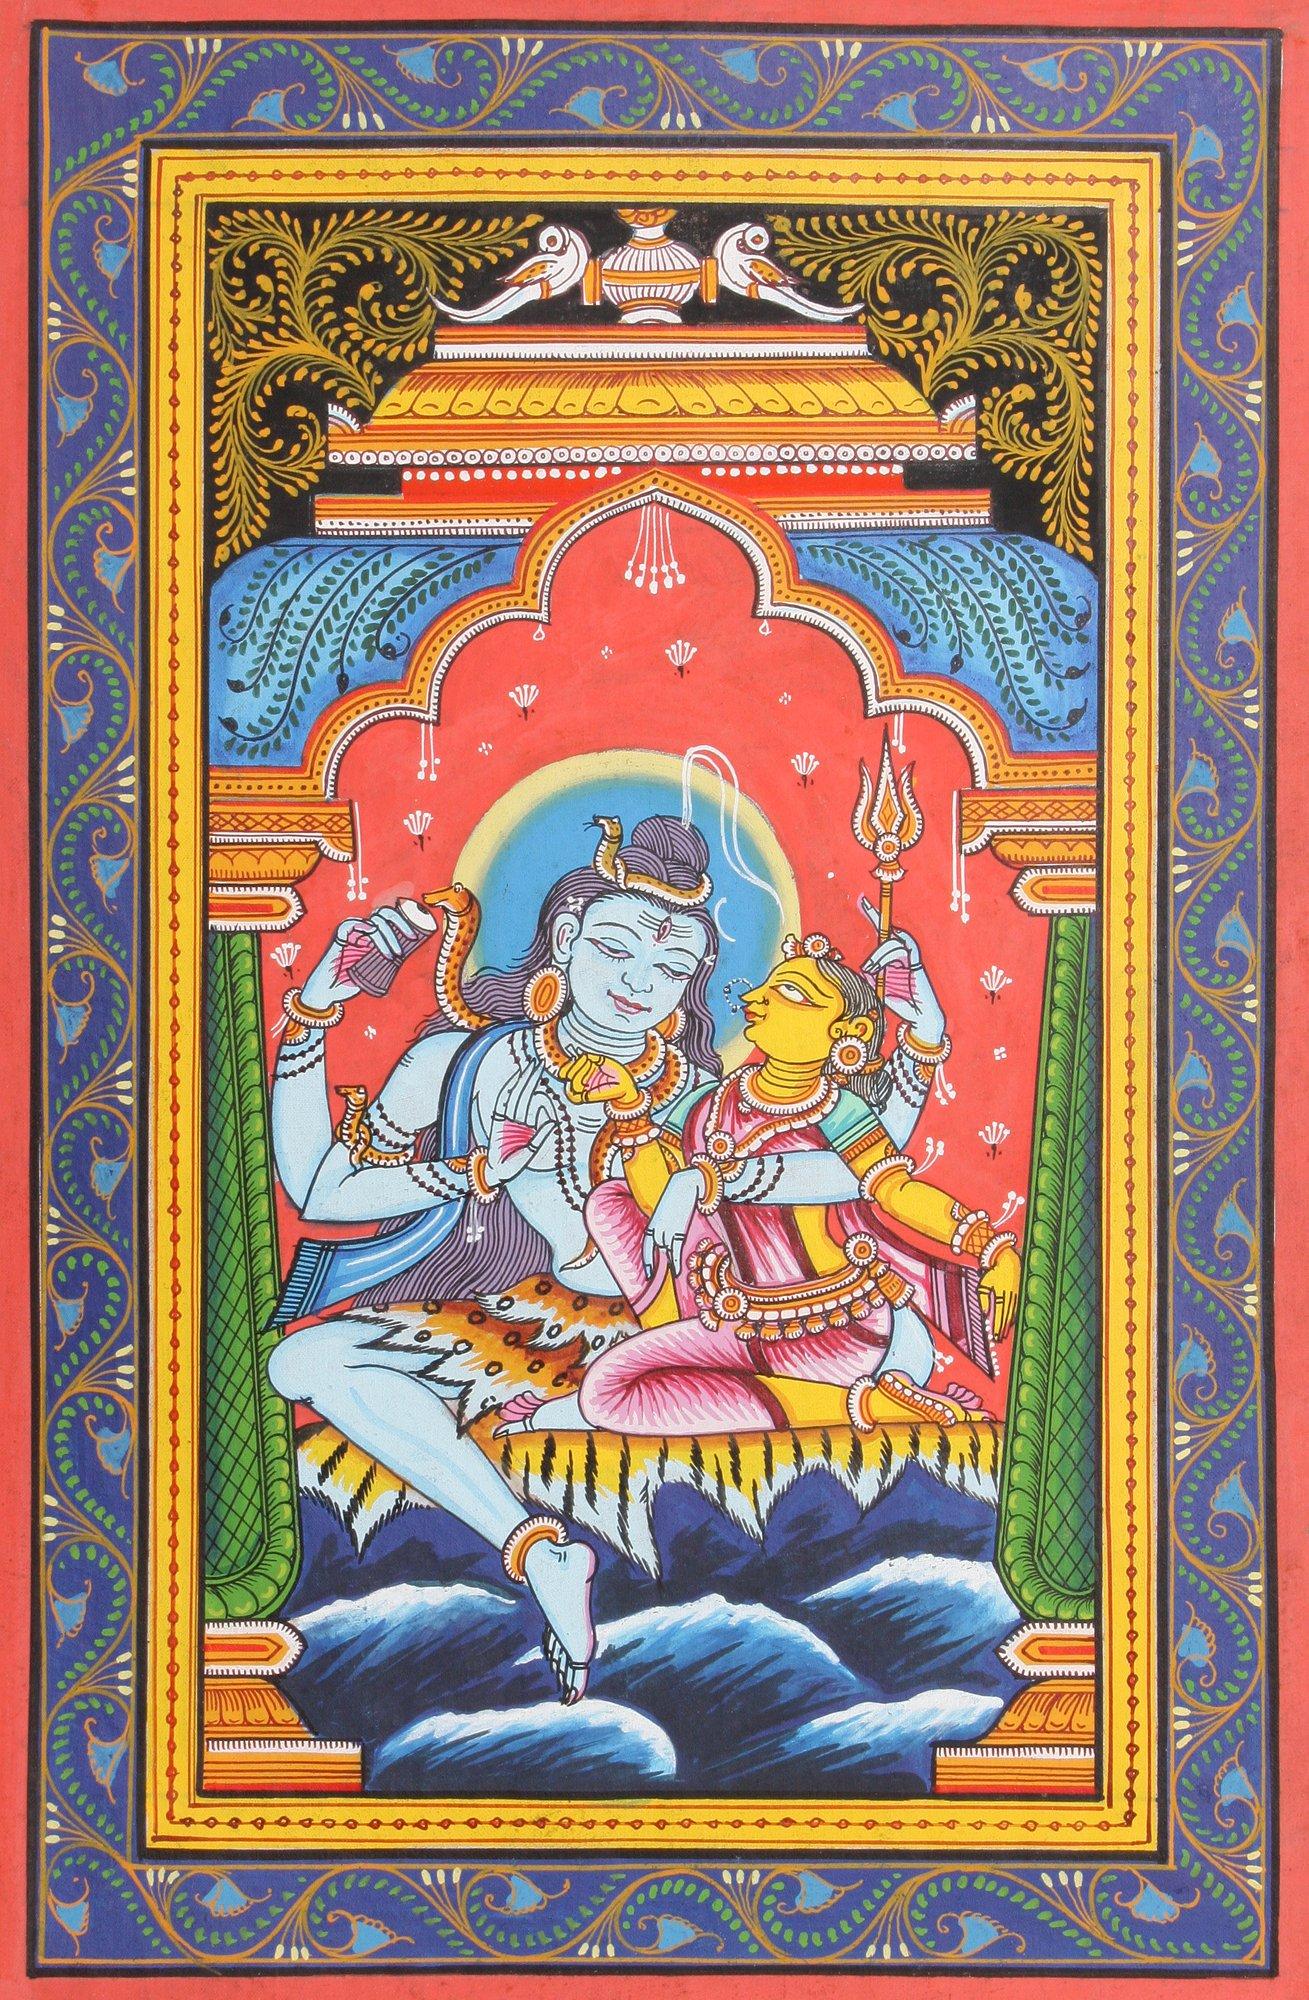 Parvati in the Lap of Shiva - Watercolor on Patti - Artist Rabi Behera